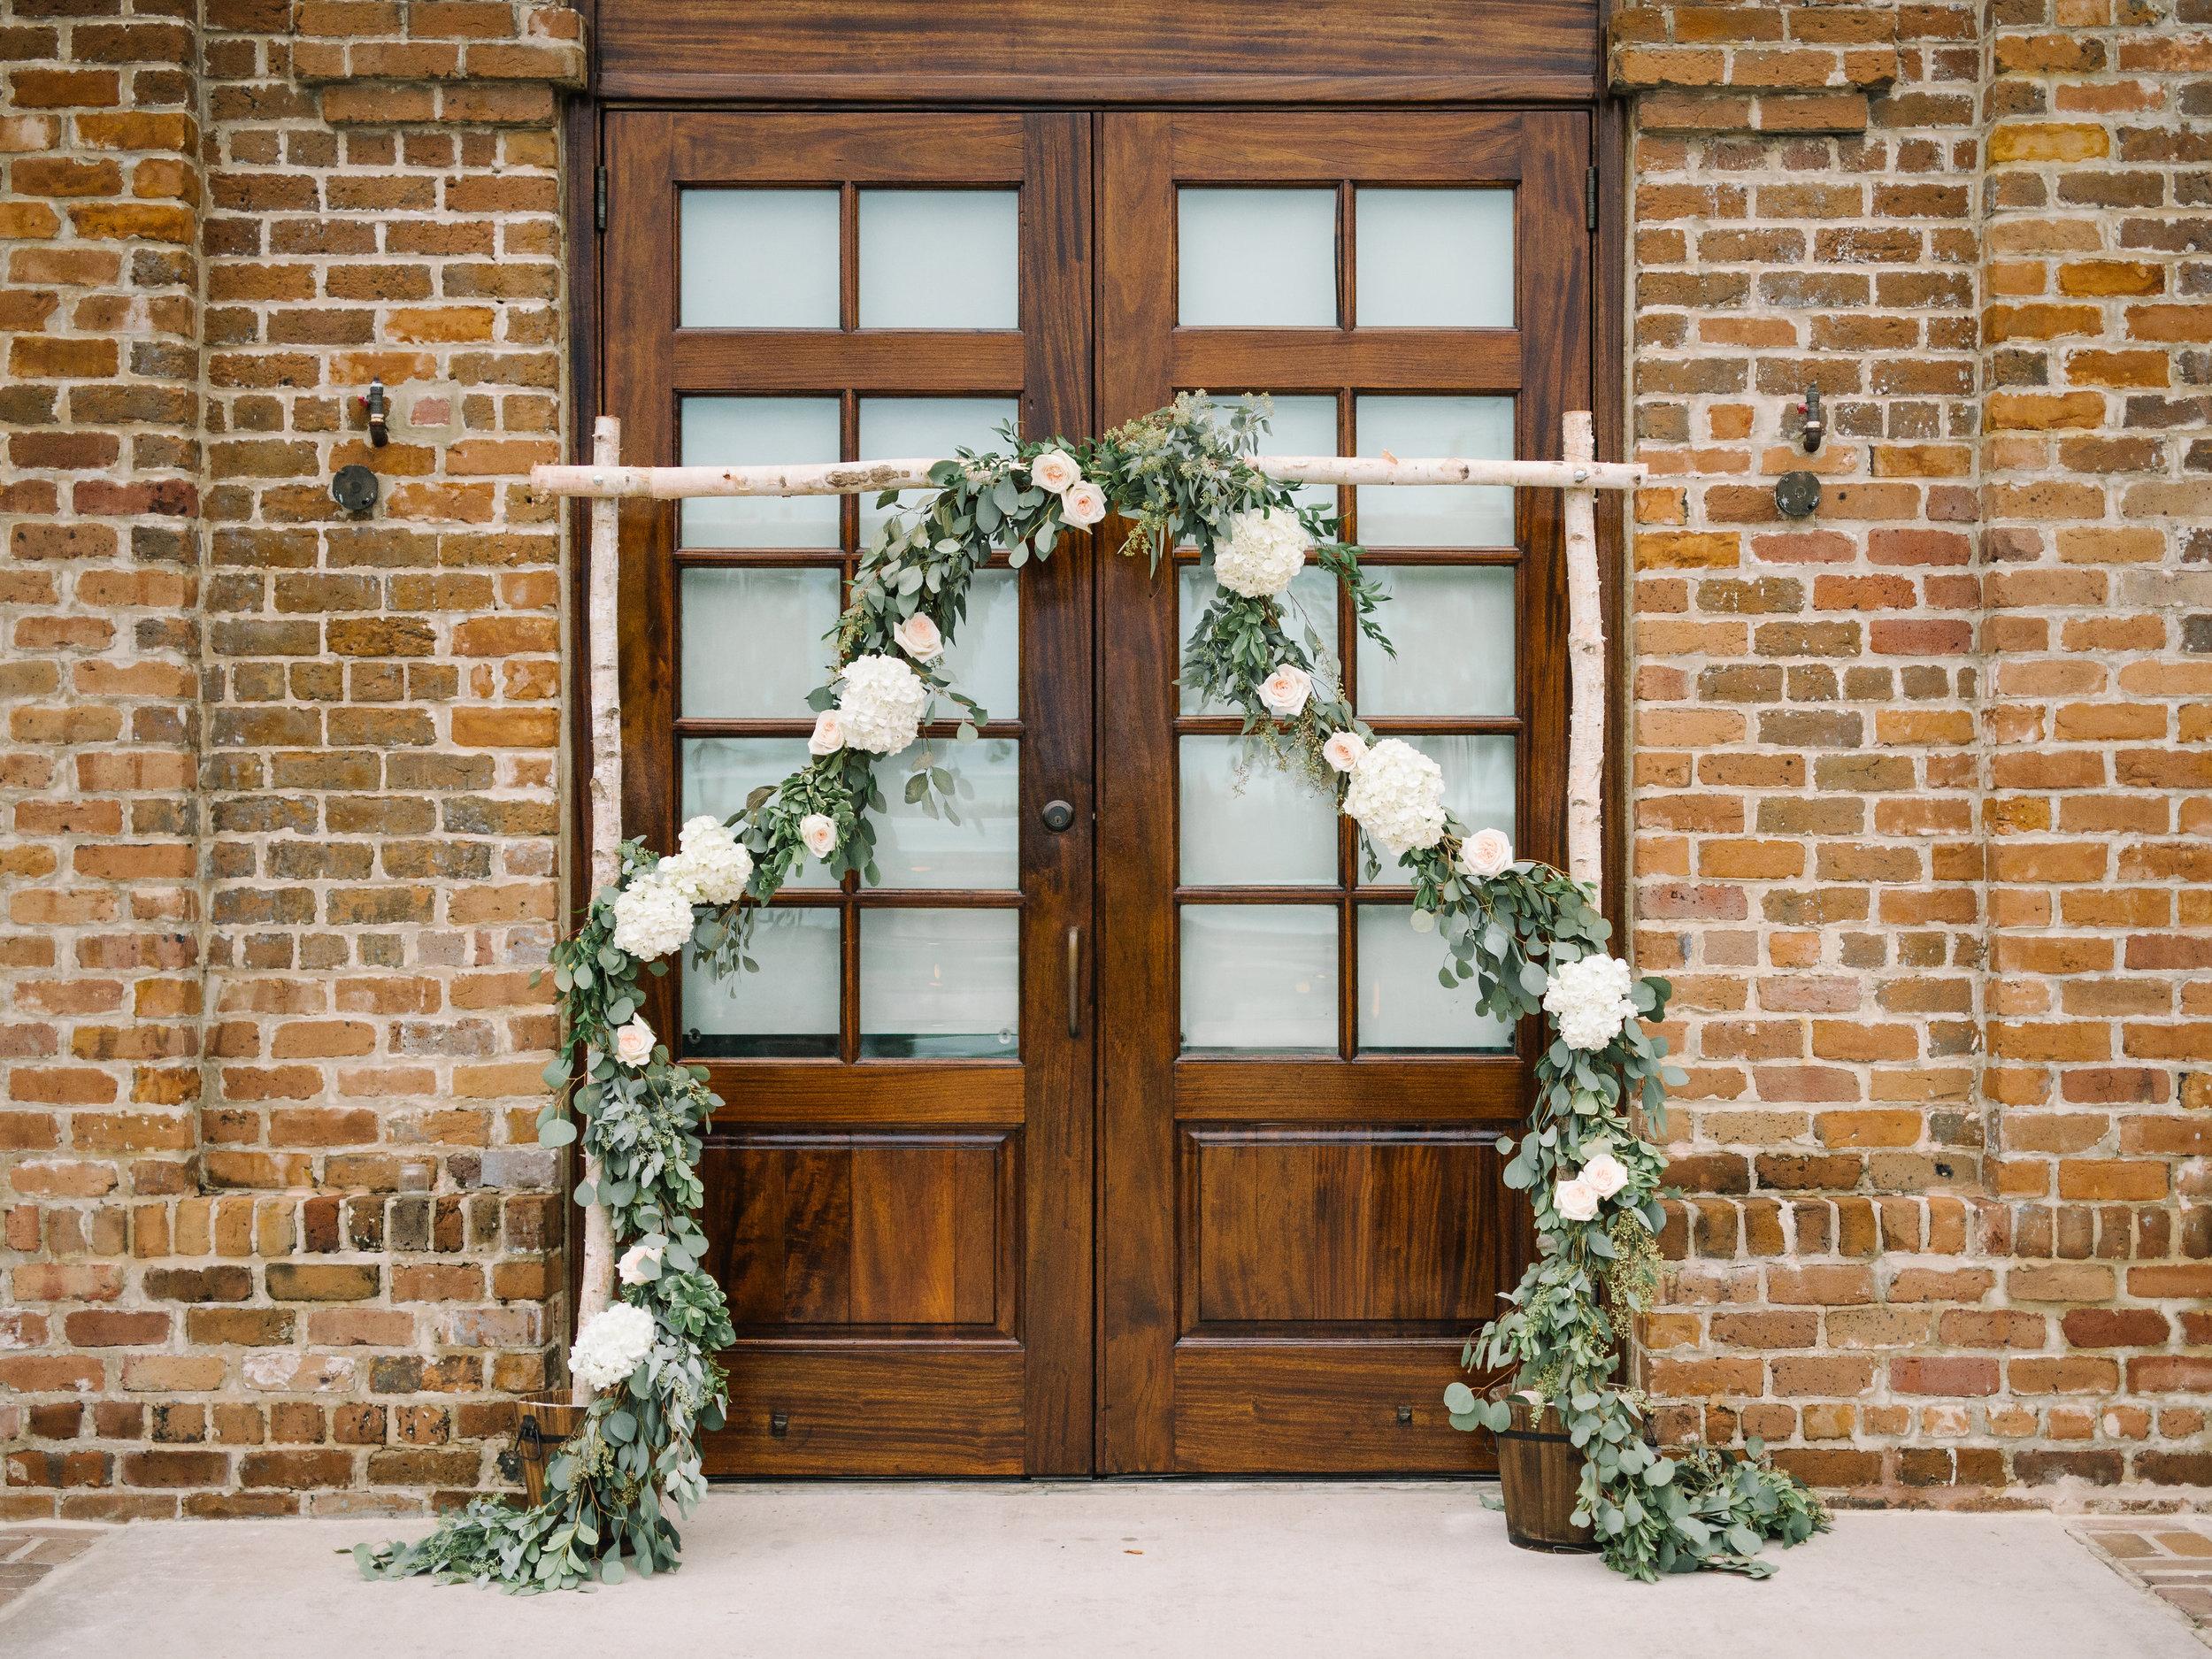 amber-and-paul-rach-loves-troy-charles-h-morris-center-wedding-sarah-seven-helene-lace-wedding-dress-ivory-and-beau-bridal-boutique-savannah-wedding-planner-savannah-event-designer-savannah-florist-savannah-weddings-savannah-bridal-boutique-23.jpg